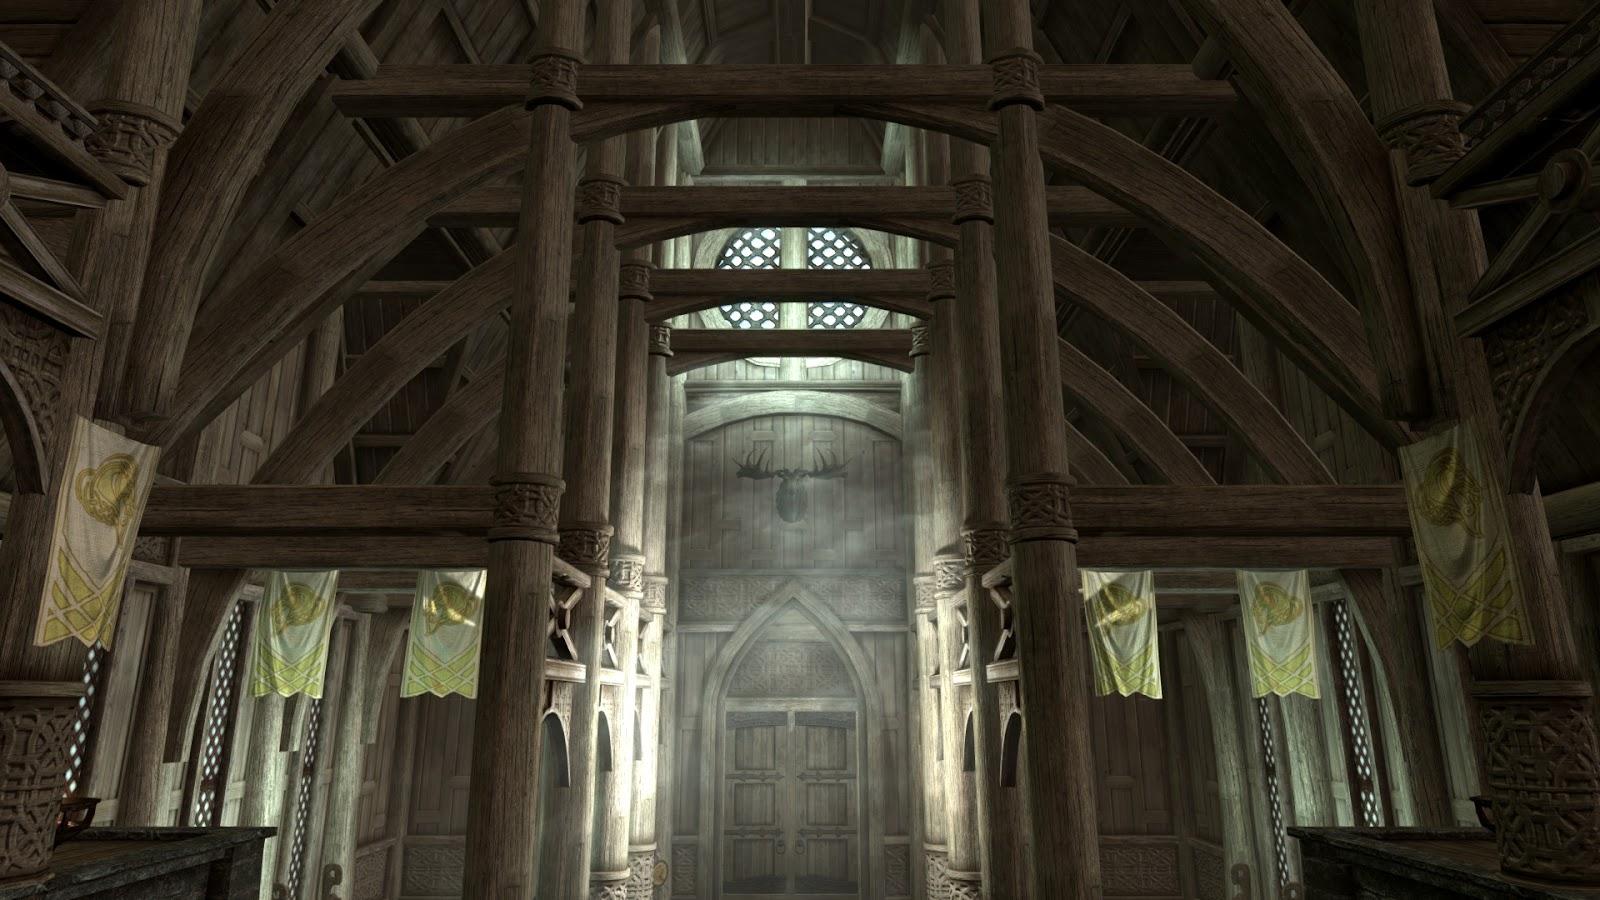 The art of architecture skyrim dragonsreach